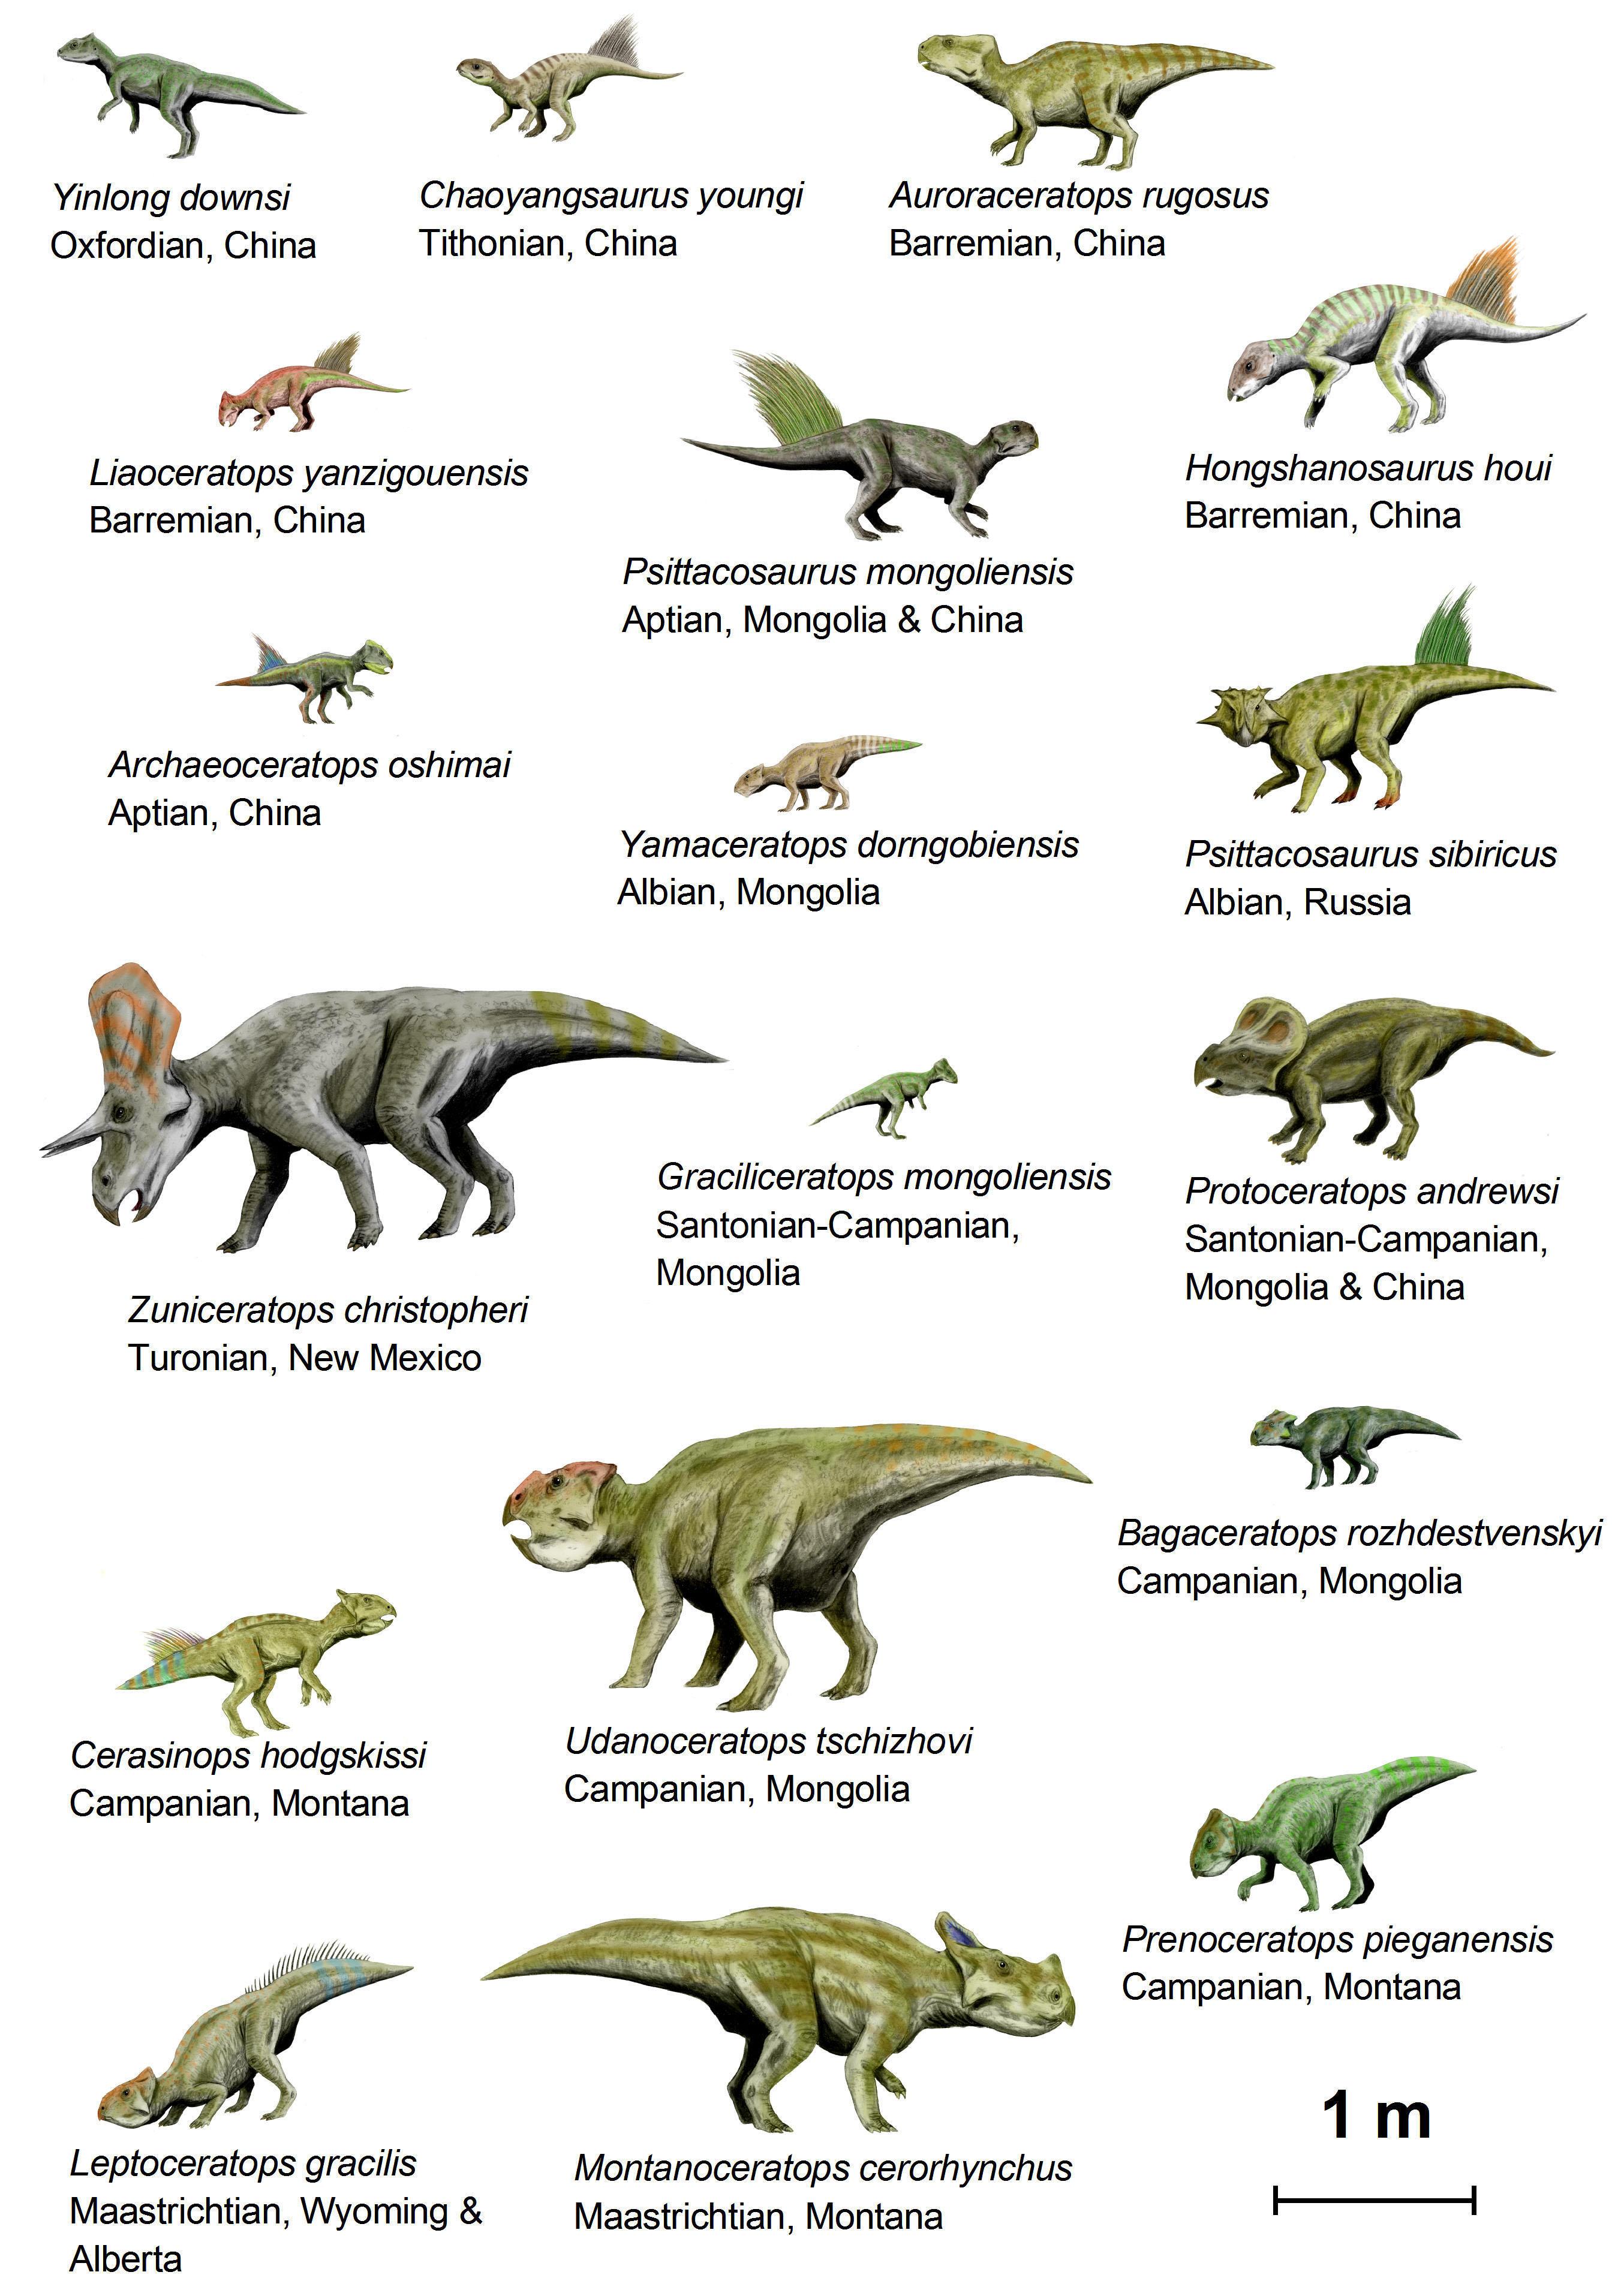 Download large image - Liste de dinosaures ...